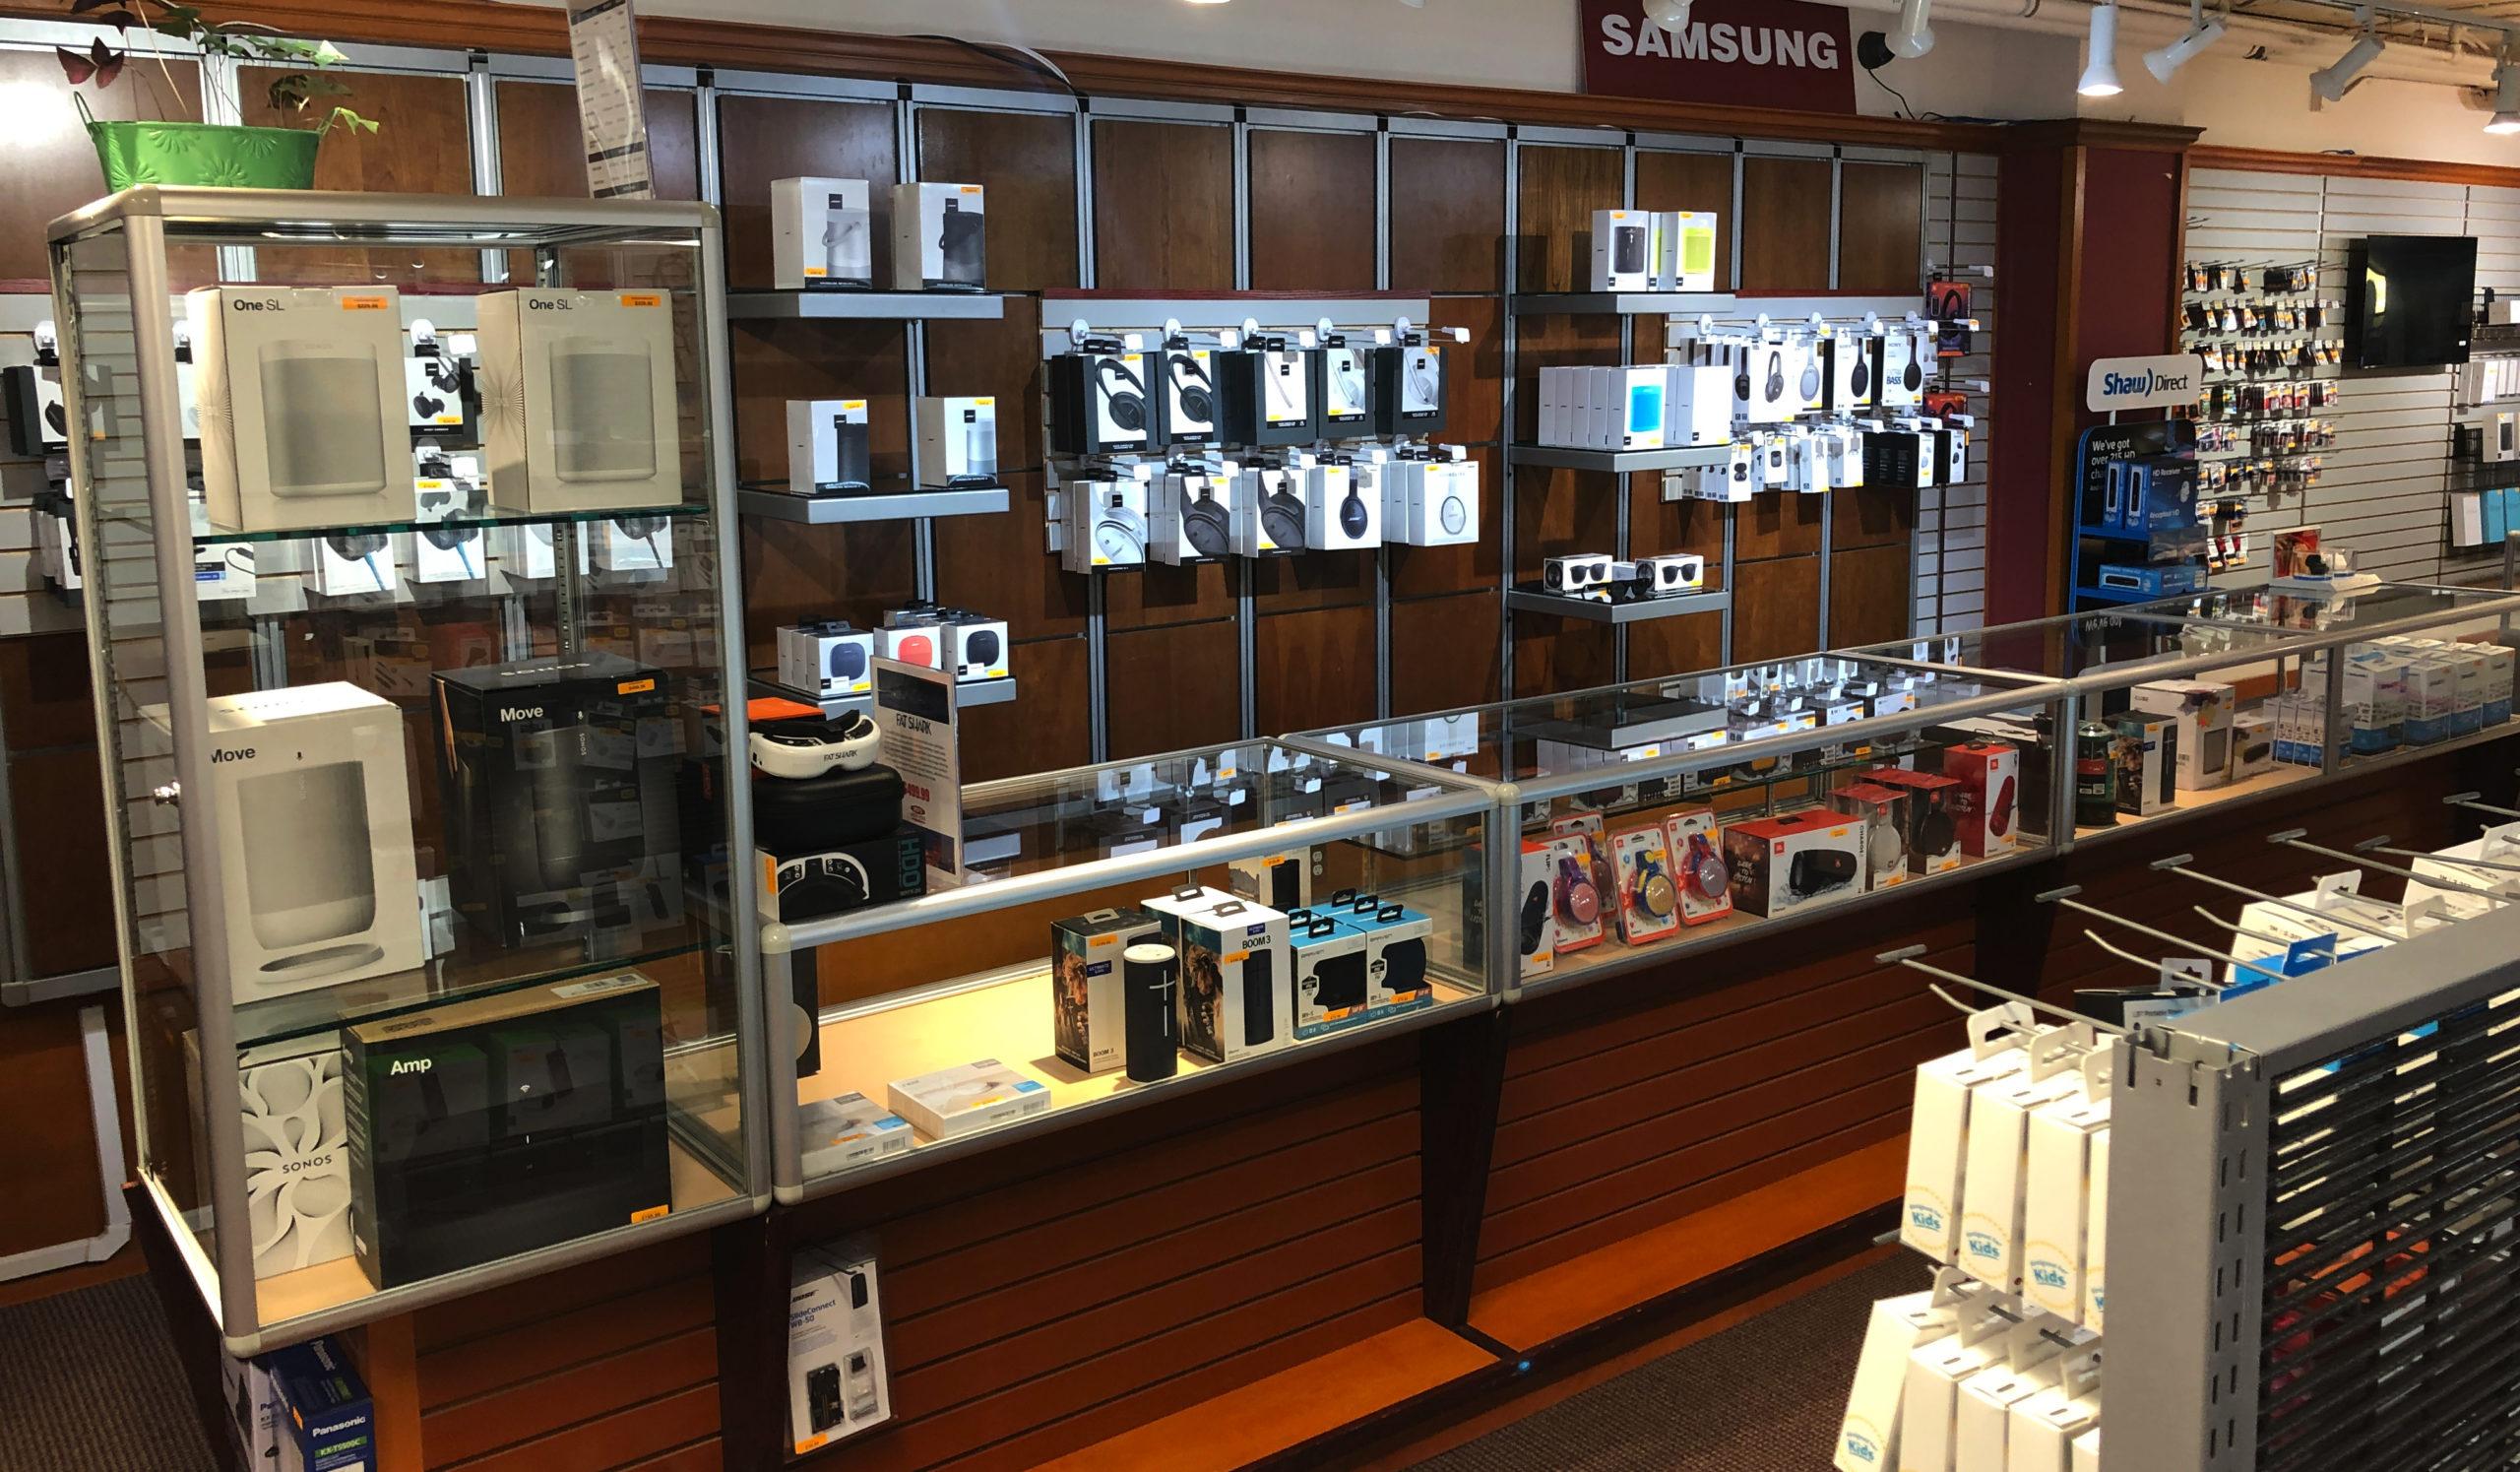 Personal electronics, bose, JBL